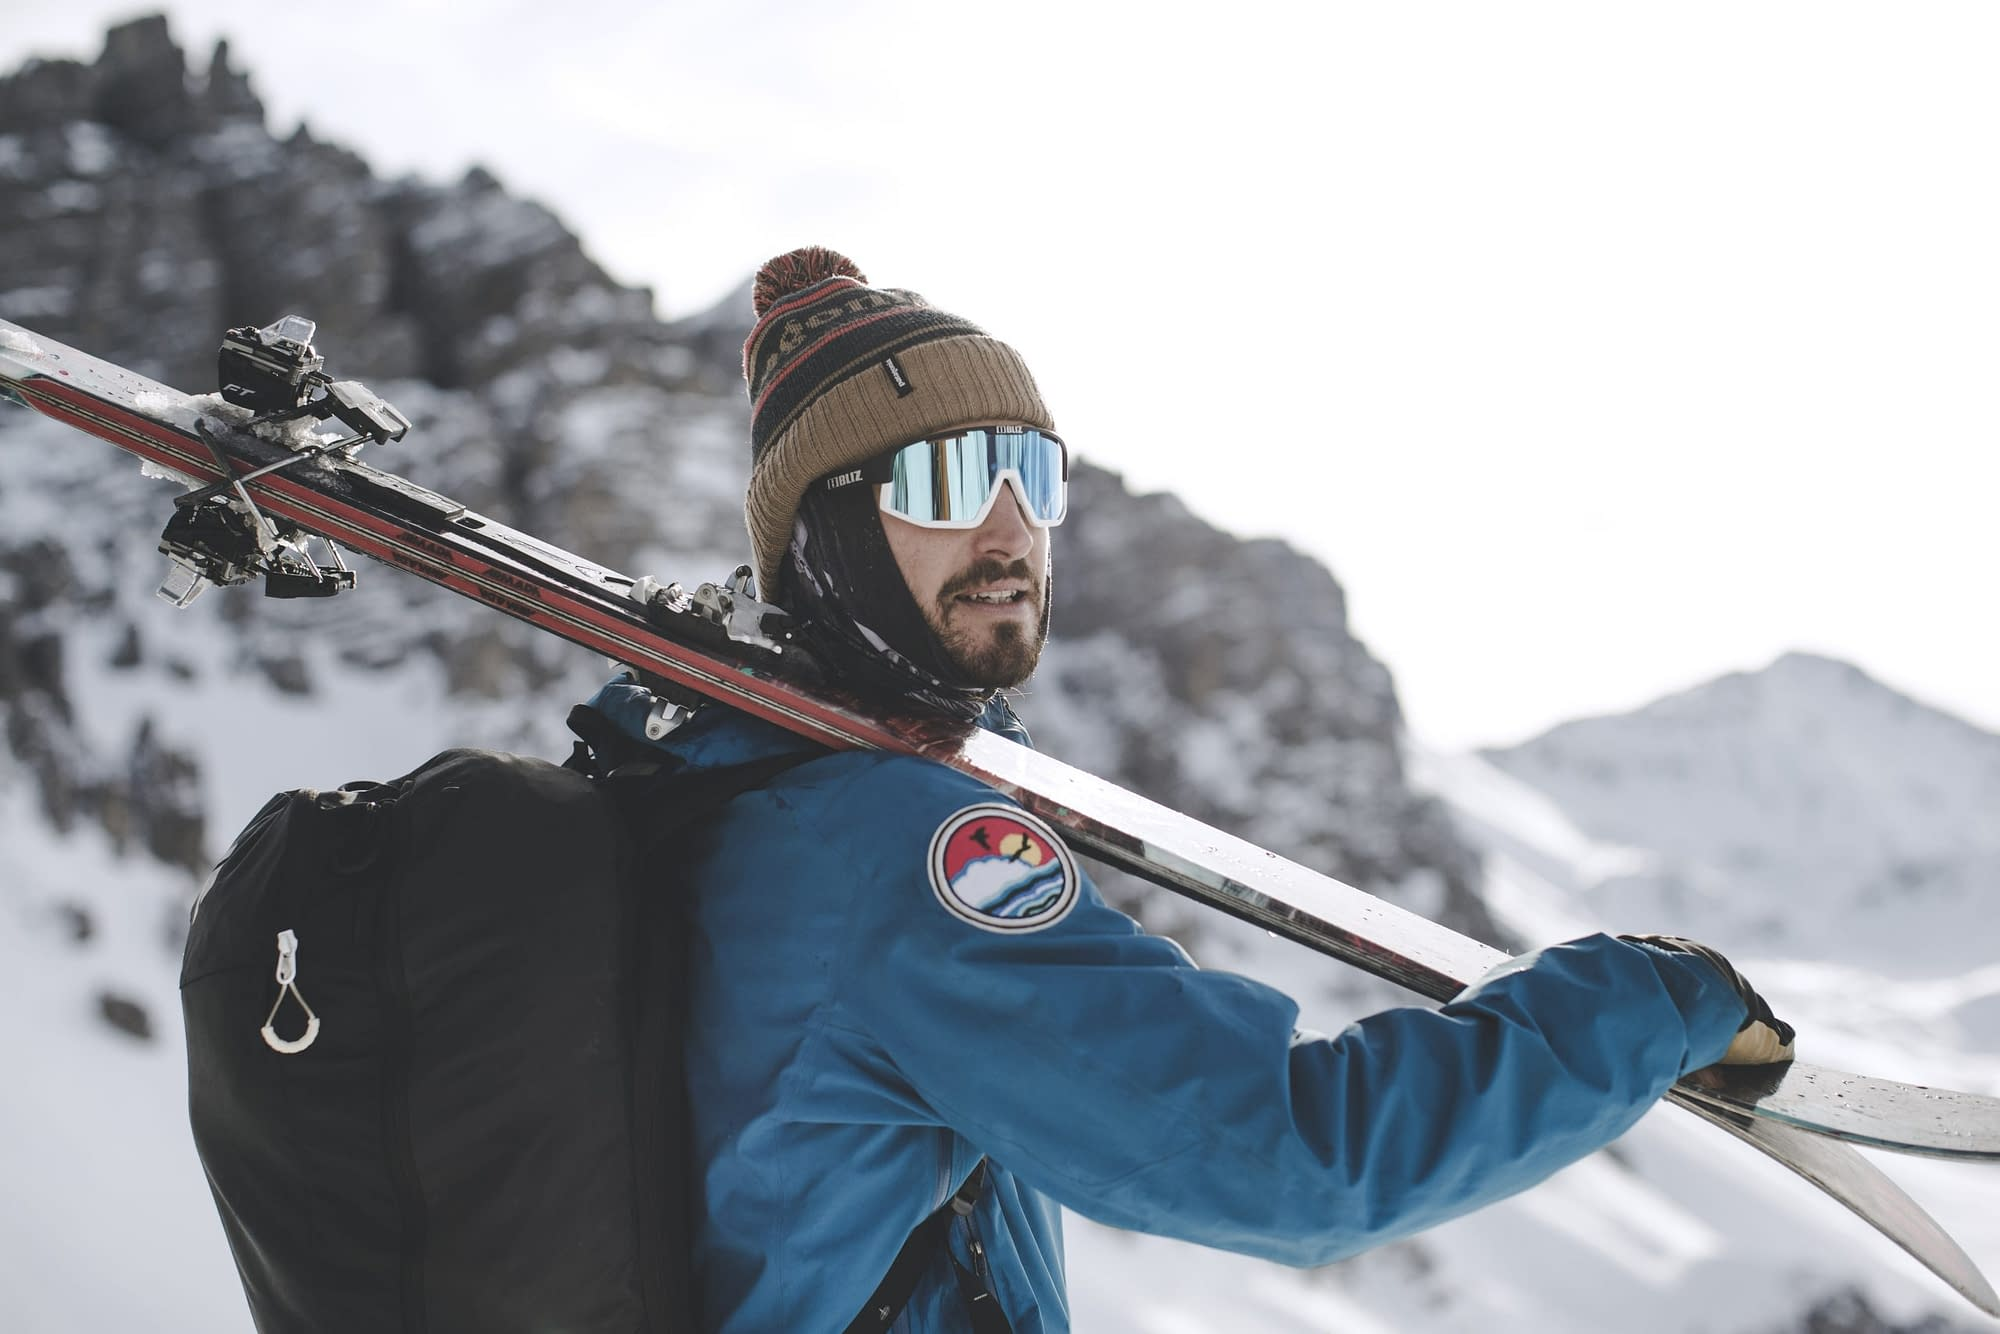 2019 01 09 Innsbruck Ski People Sc 9749 Hr